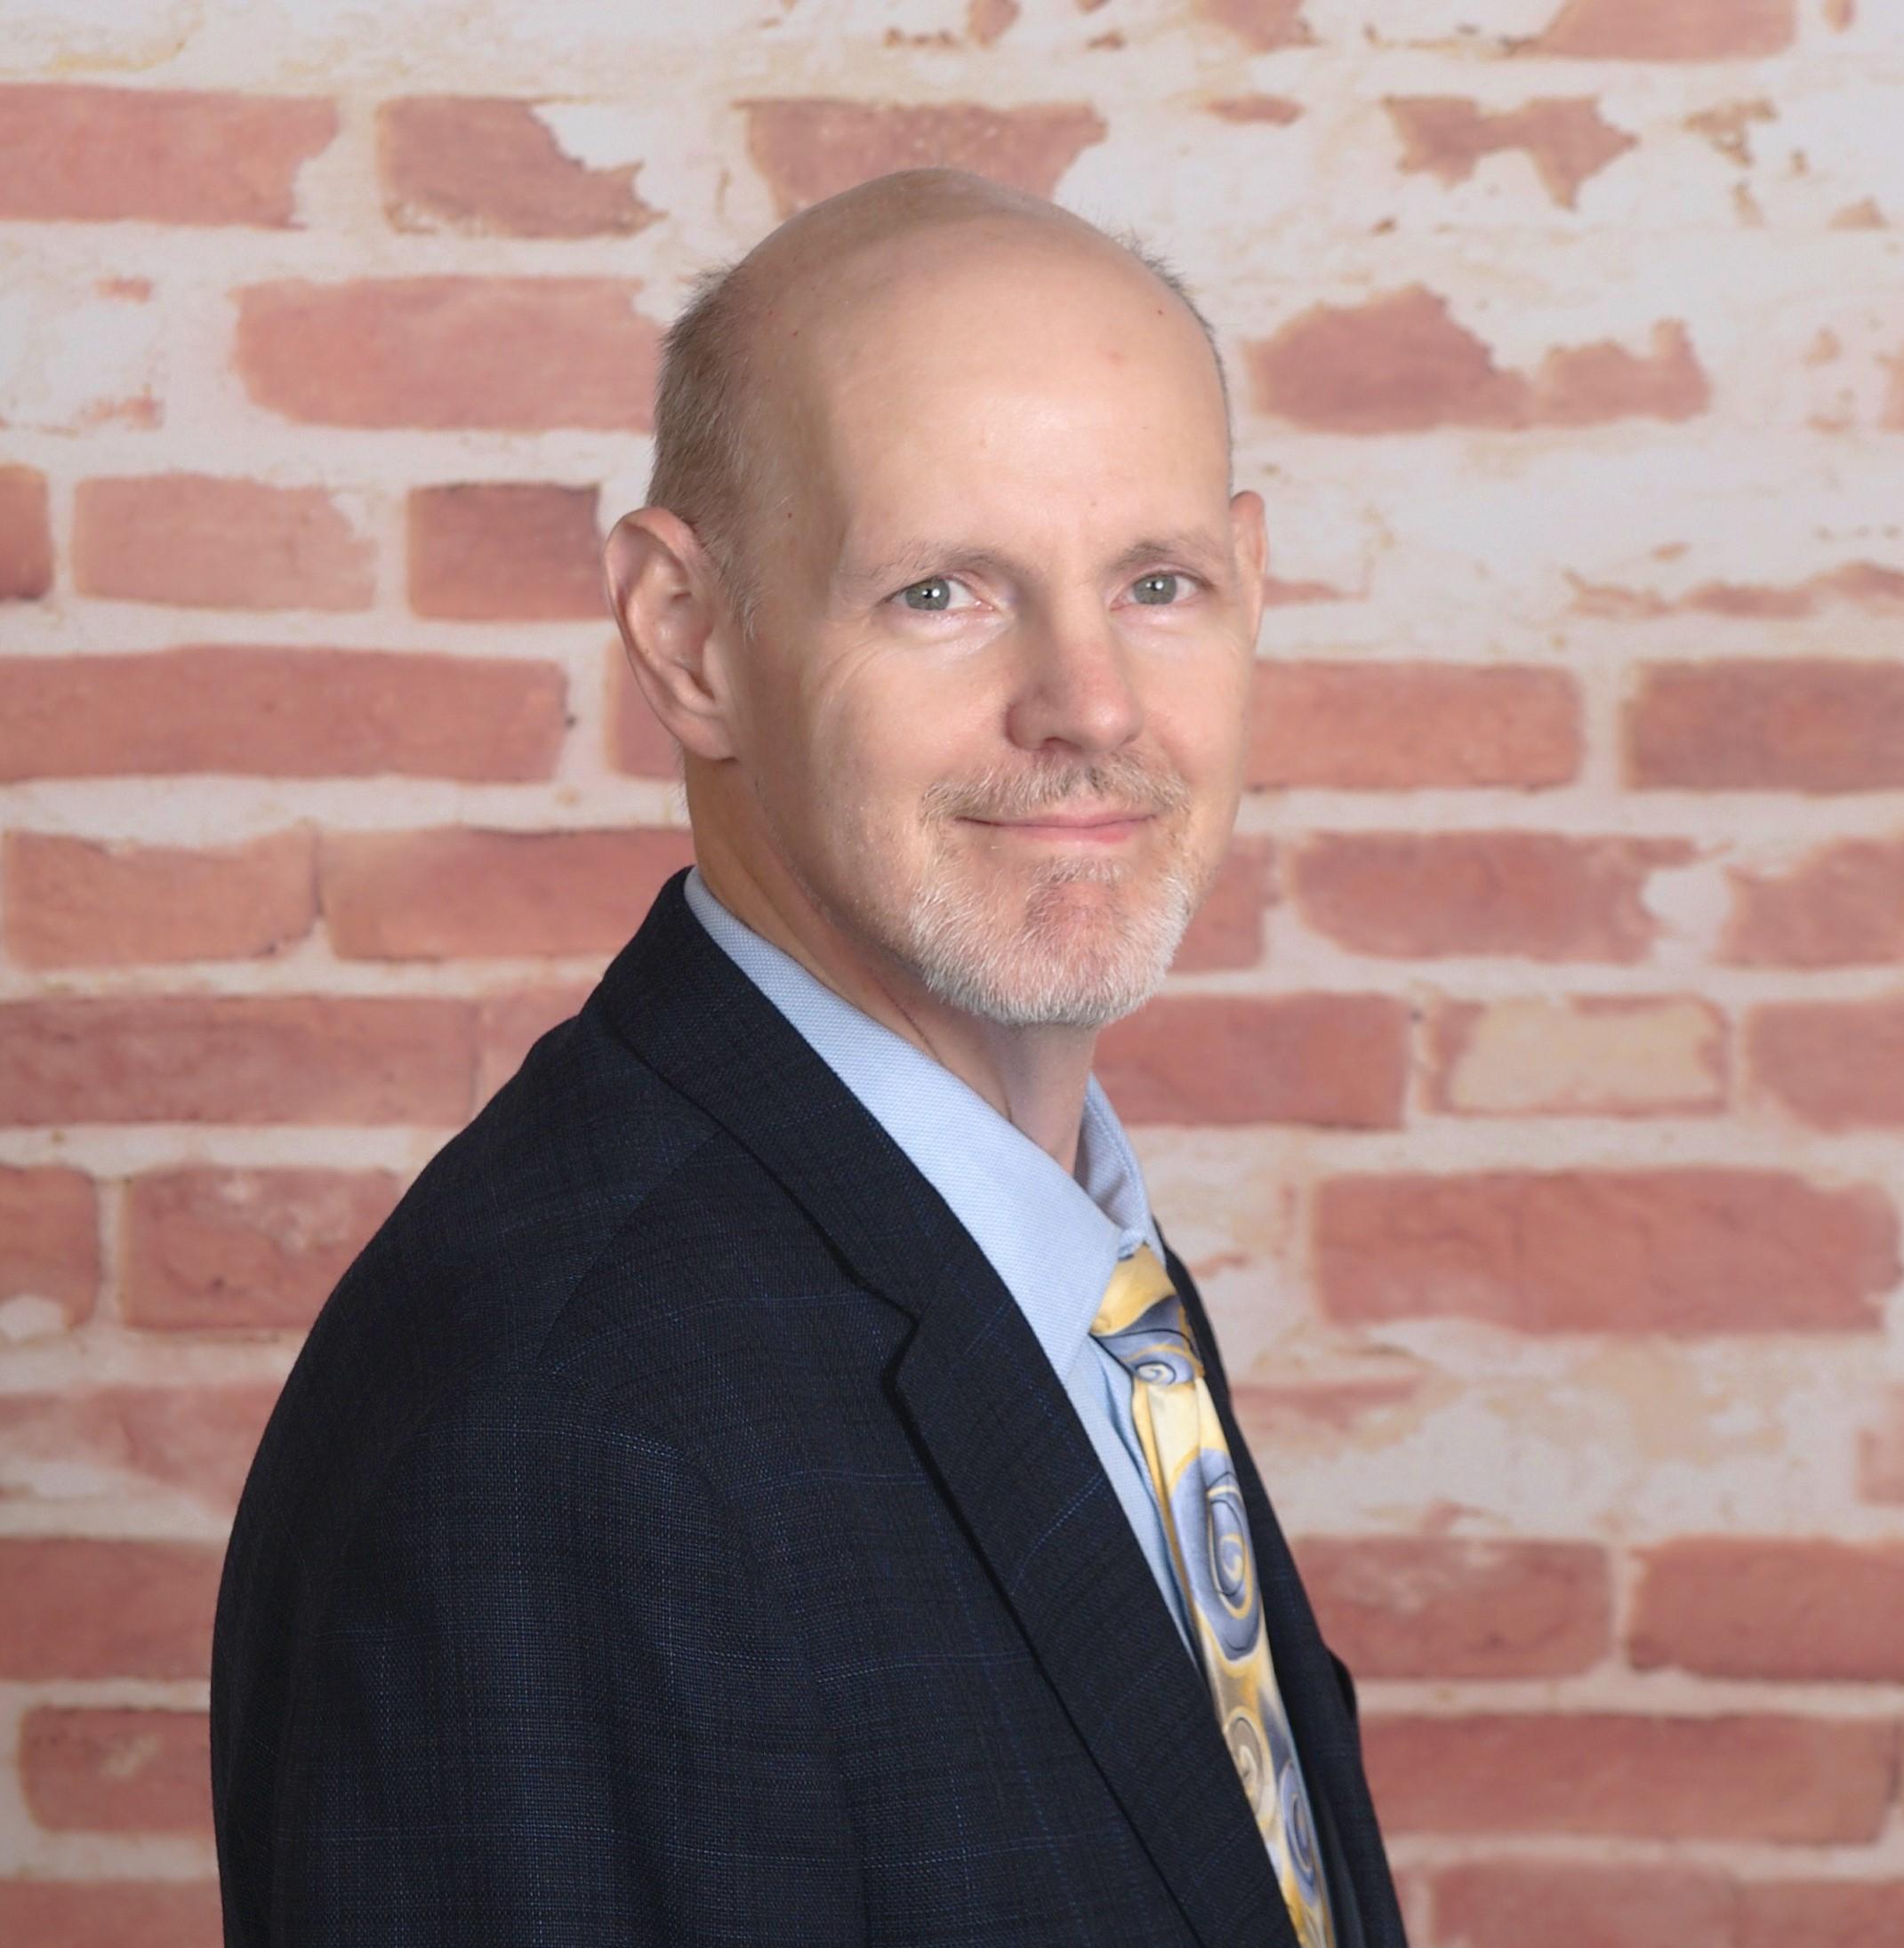 Dave Hoekstra, WFM Expert at Calabrio